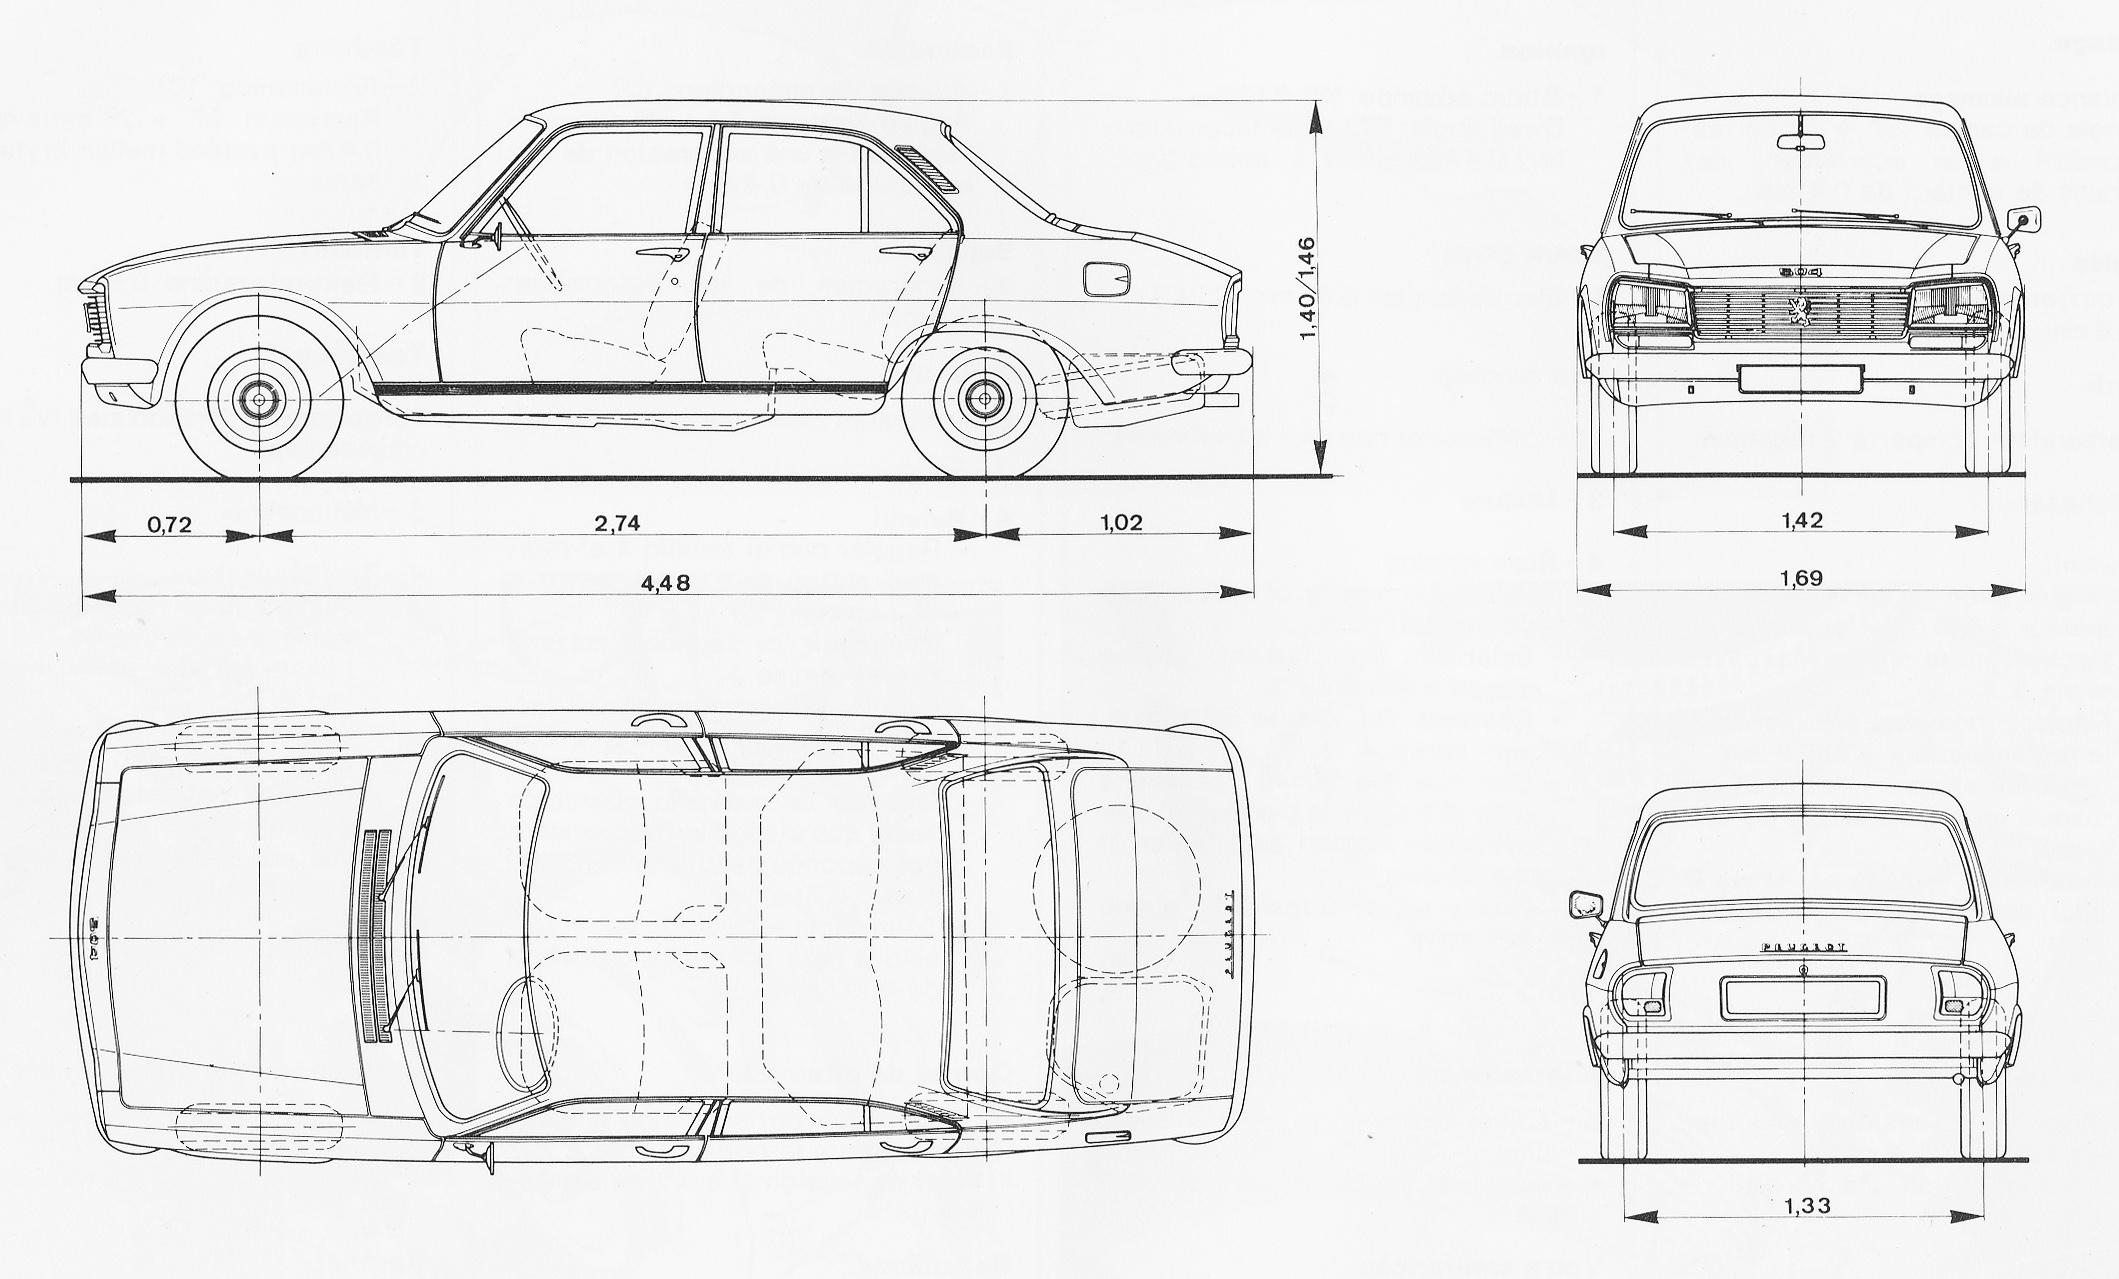 Peugeot 504 Group 2